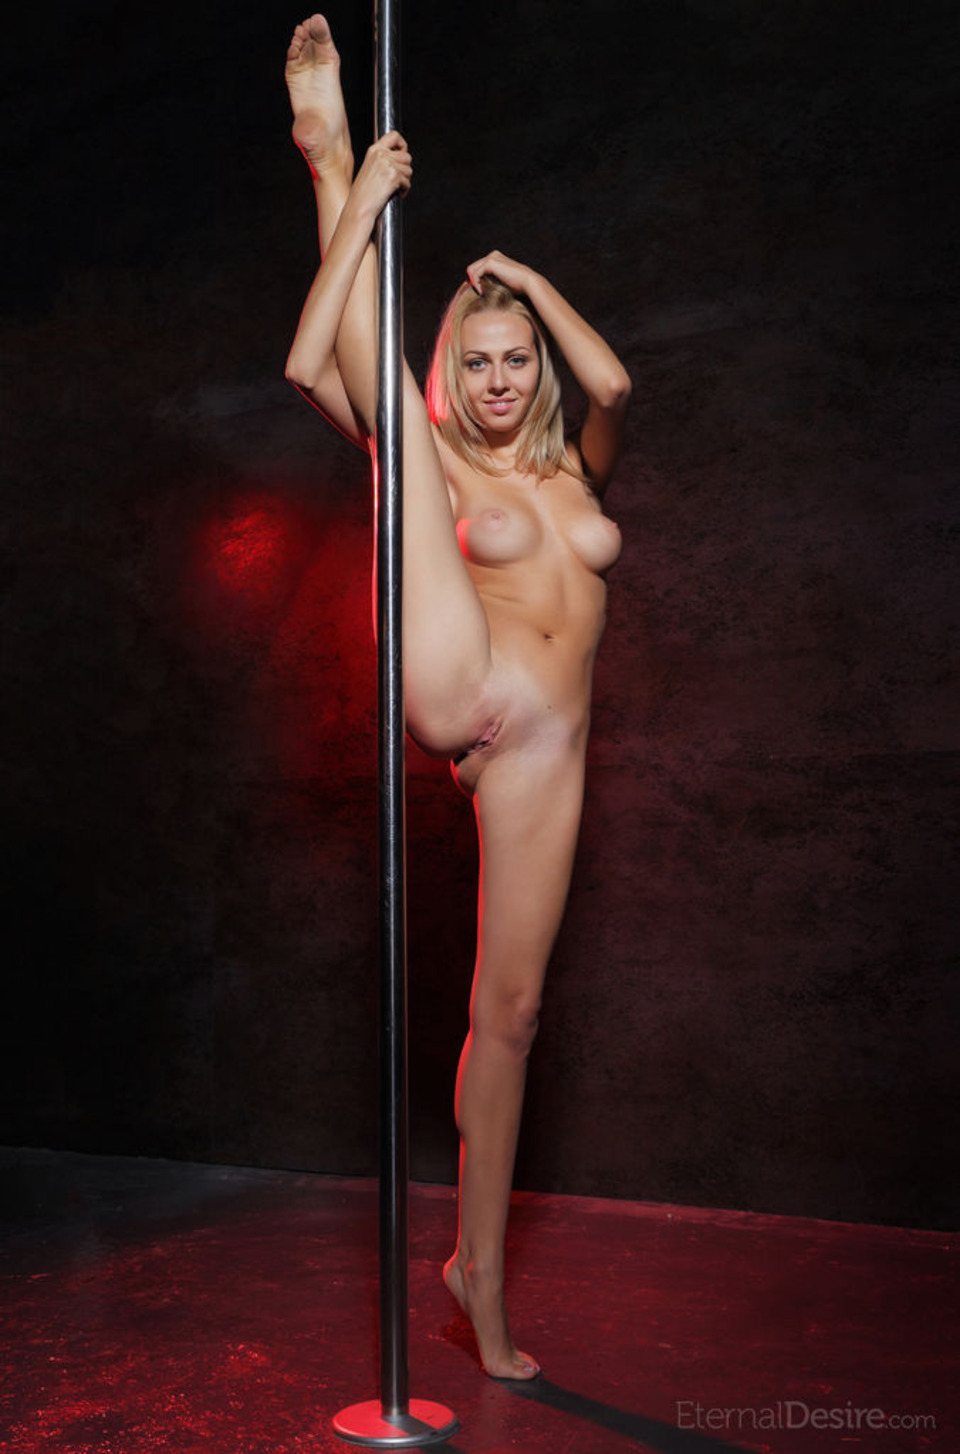 Красивые девушки танцуют стриптиз голые - Онлайн клипы 18+ для ...